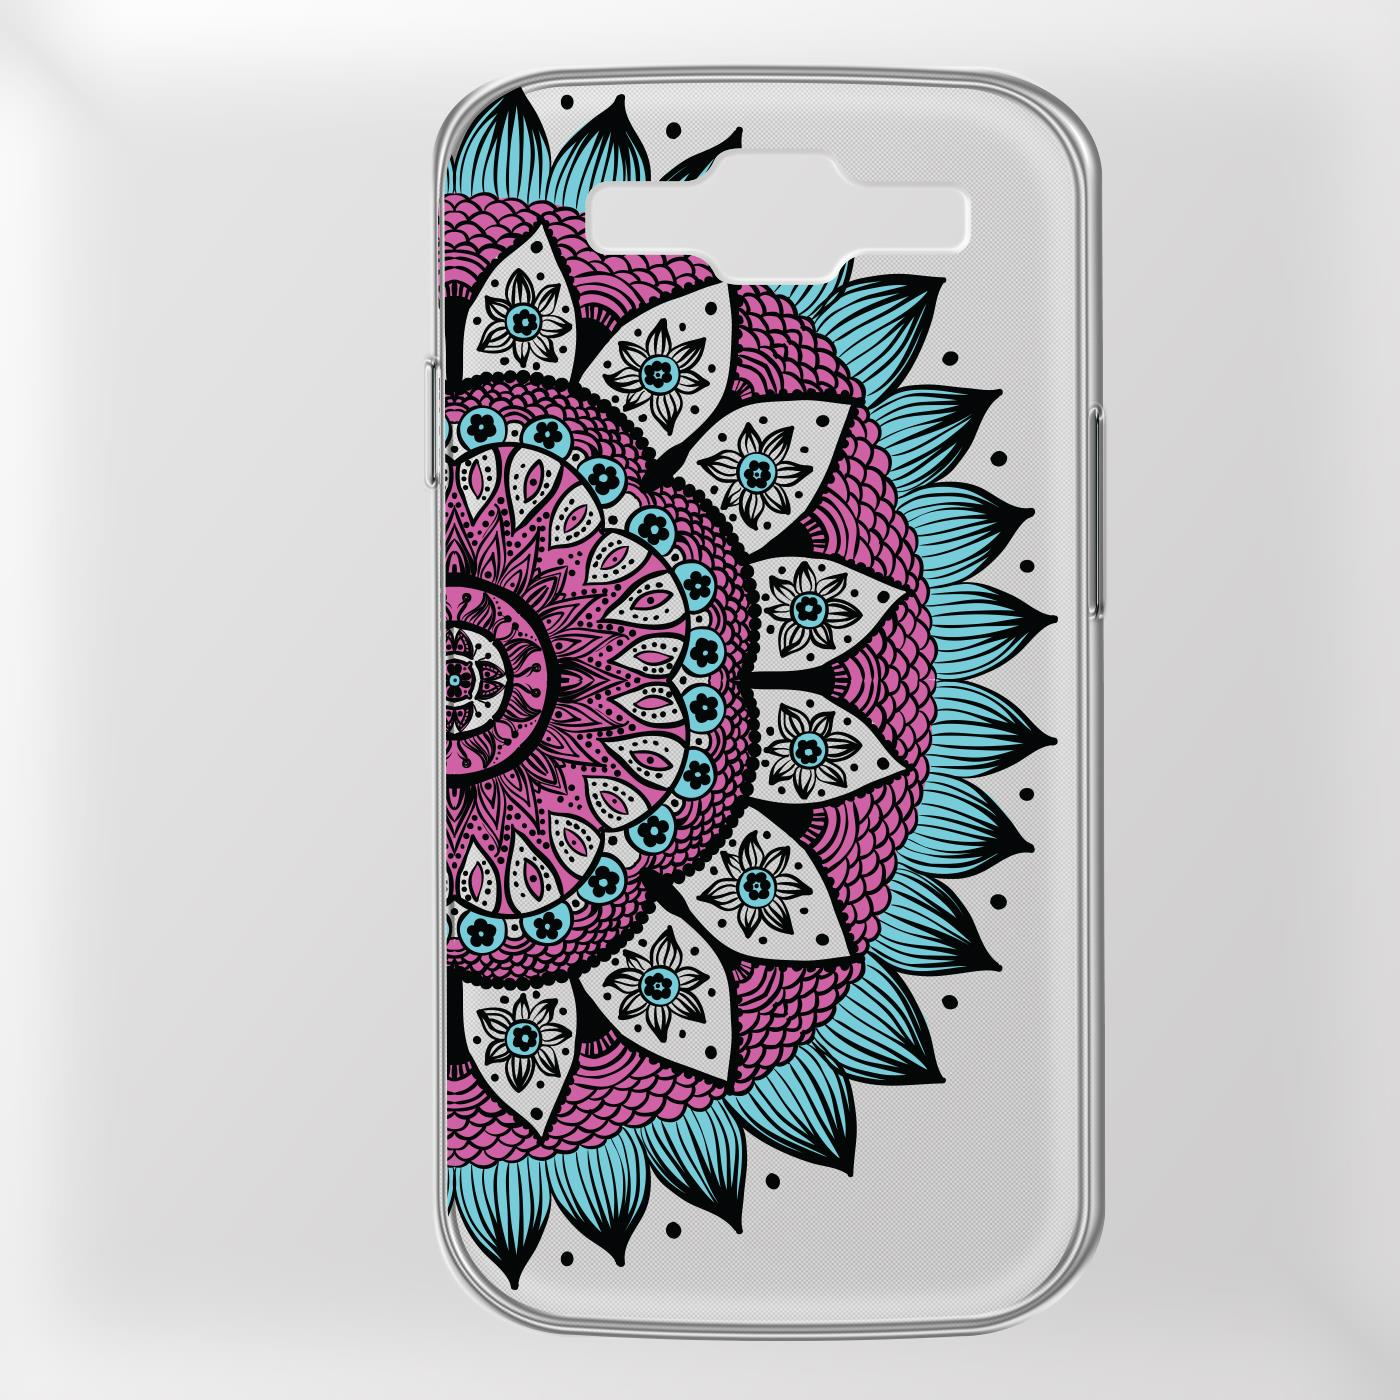 Samsung-Galaxy-S3-Neo-Handy-Schutz-Huelle-Case-TPU-Silikon-Cover-Tasche-Mandala Indexbild 16